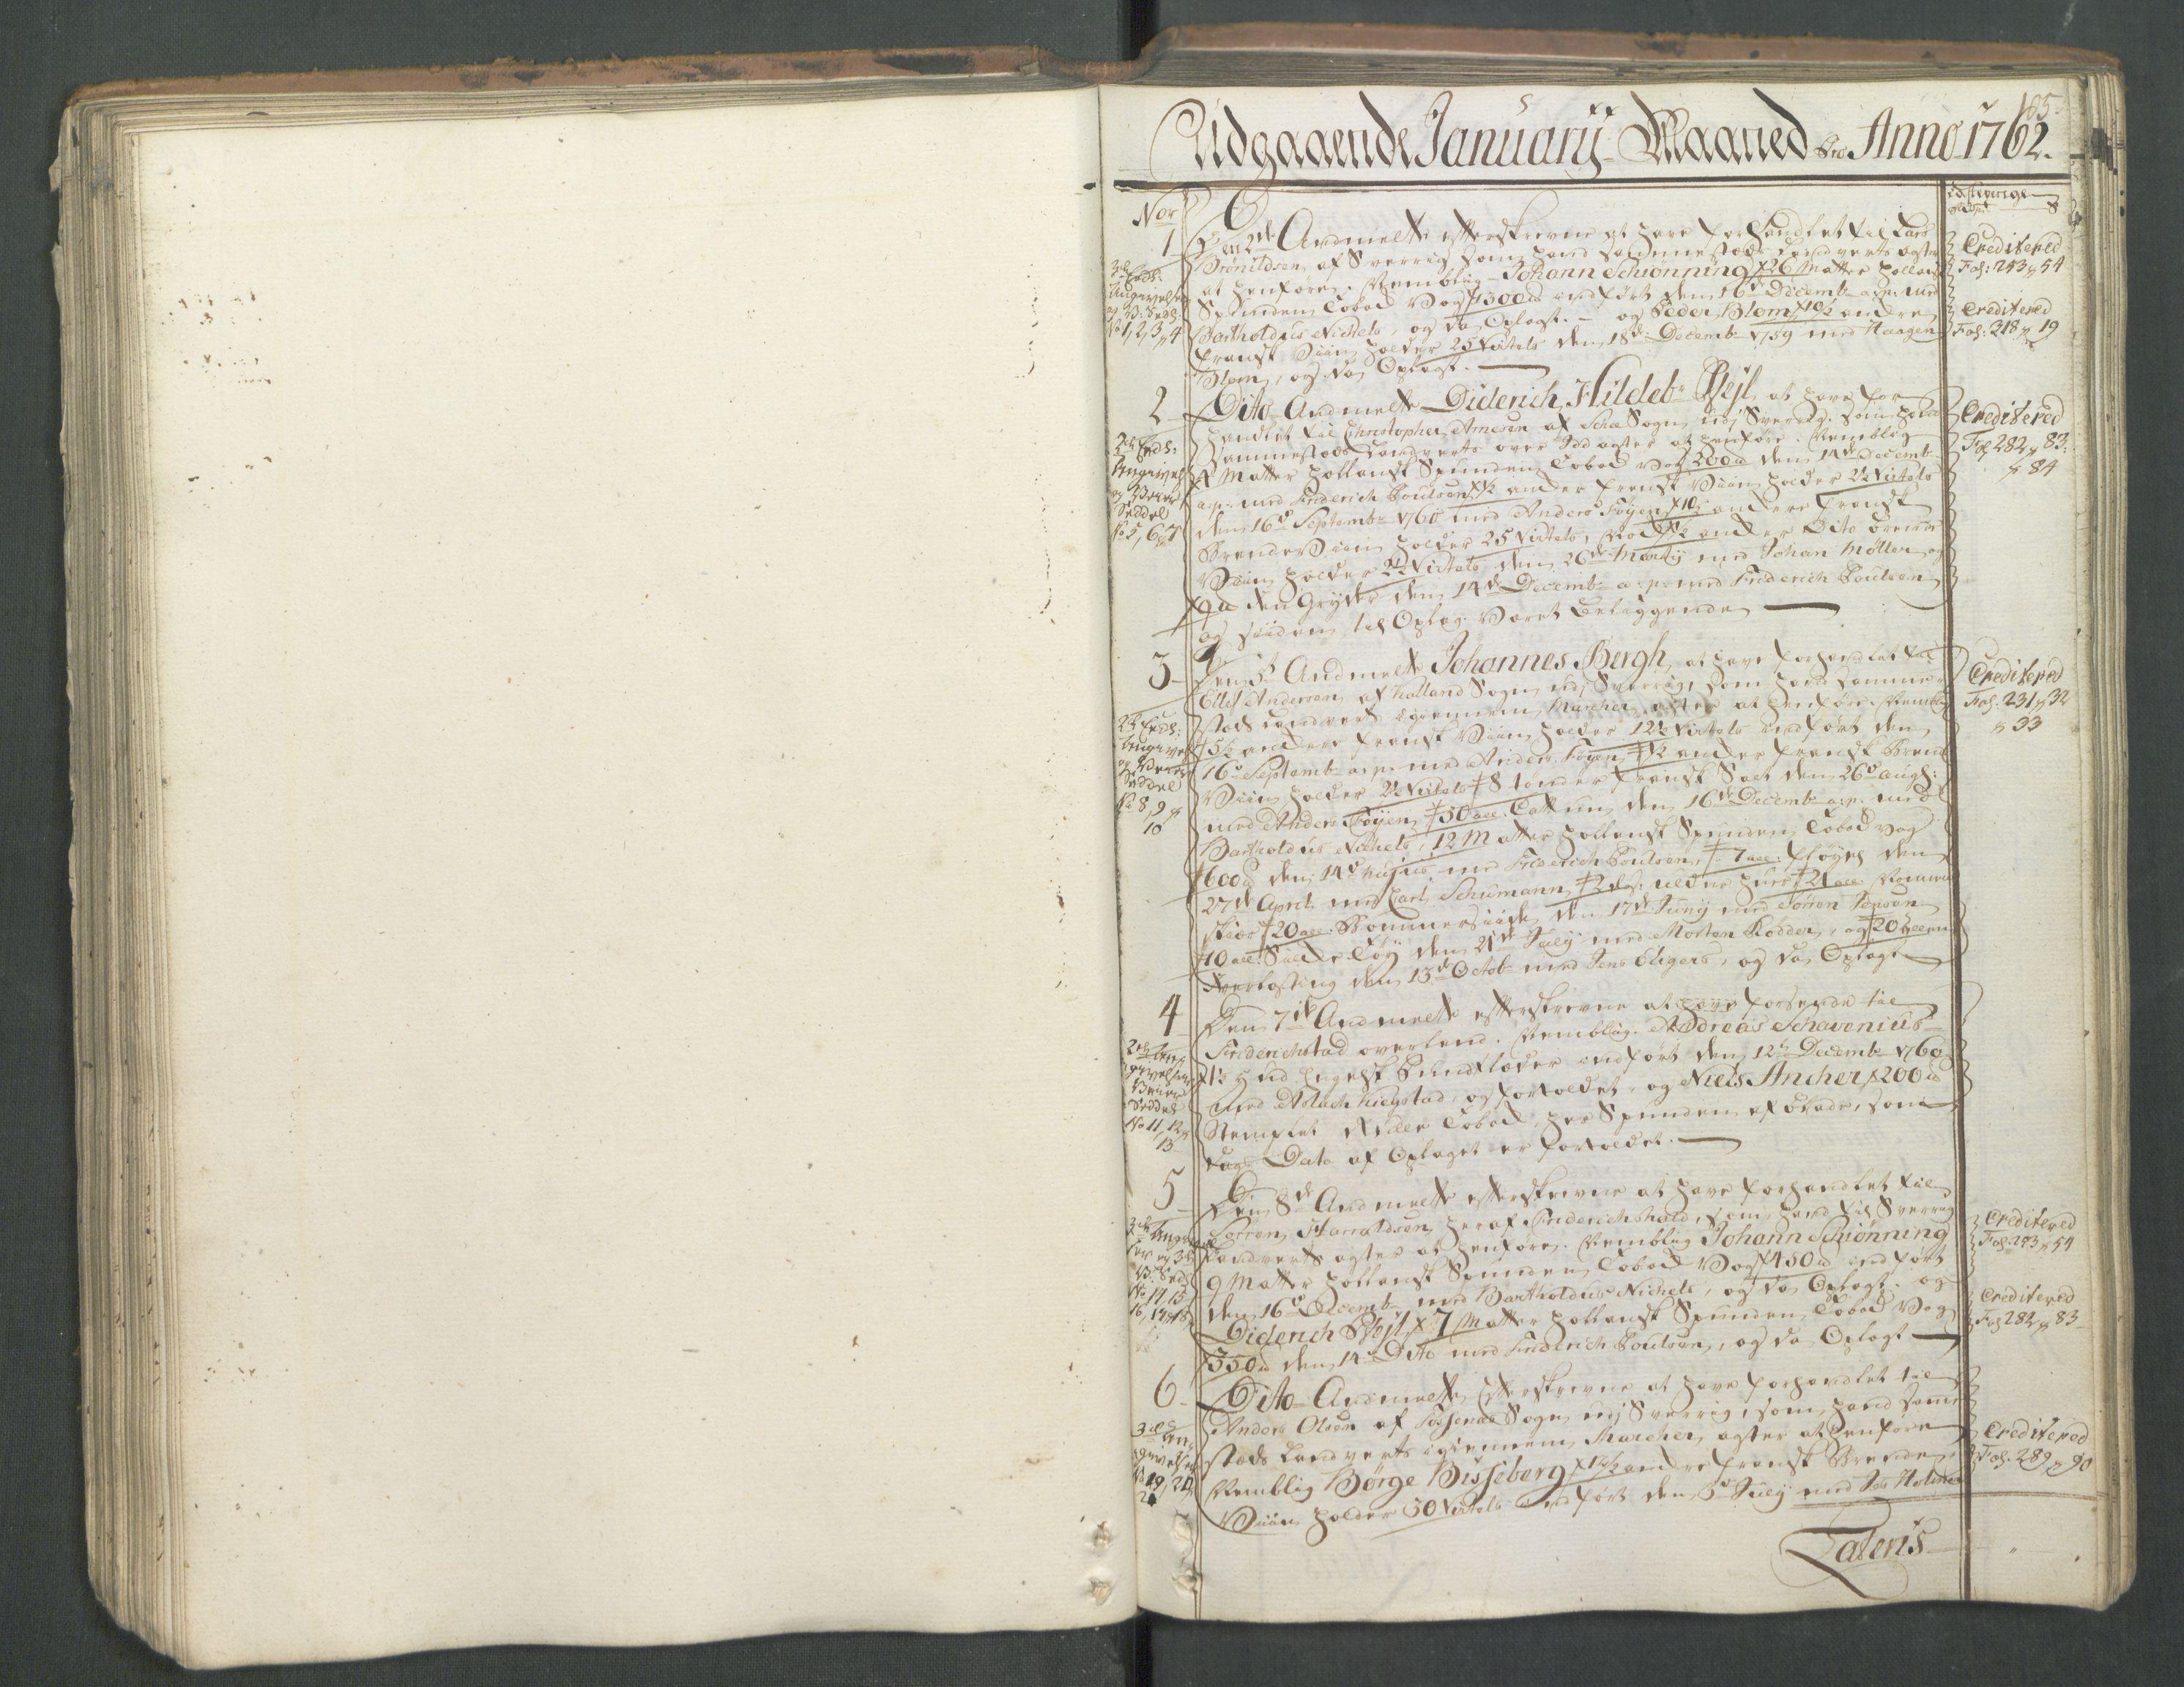 RA, Generaltollkammeret, tollregnskaper, R01/L0046: Tollregnskaper Fredrikshald, 1762, s. 104b-105a